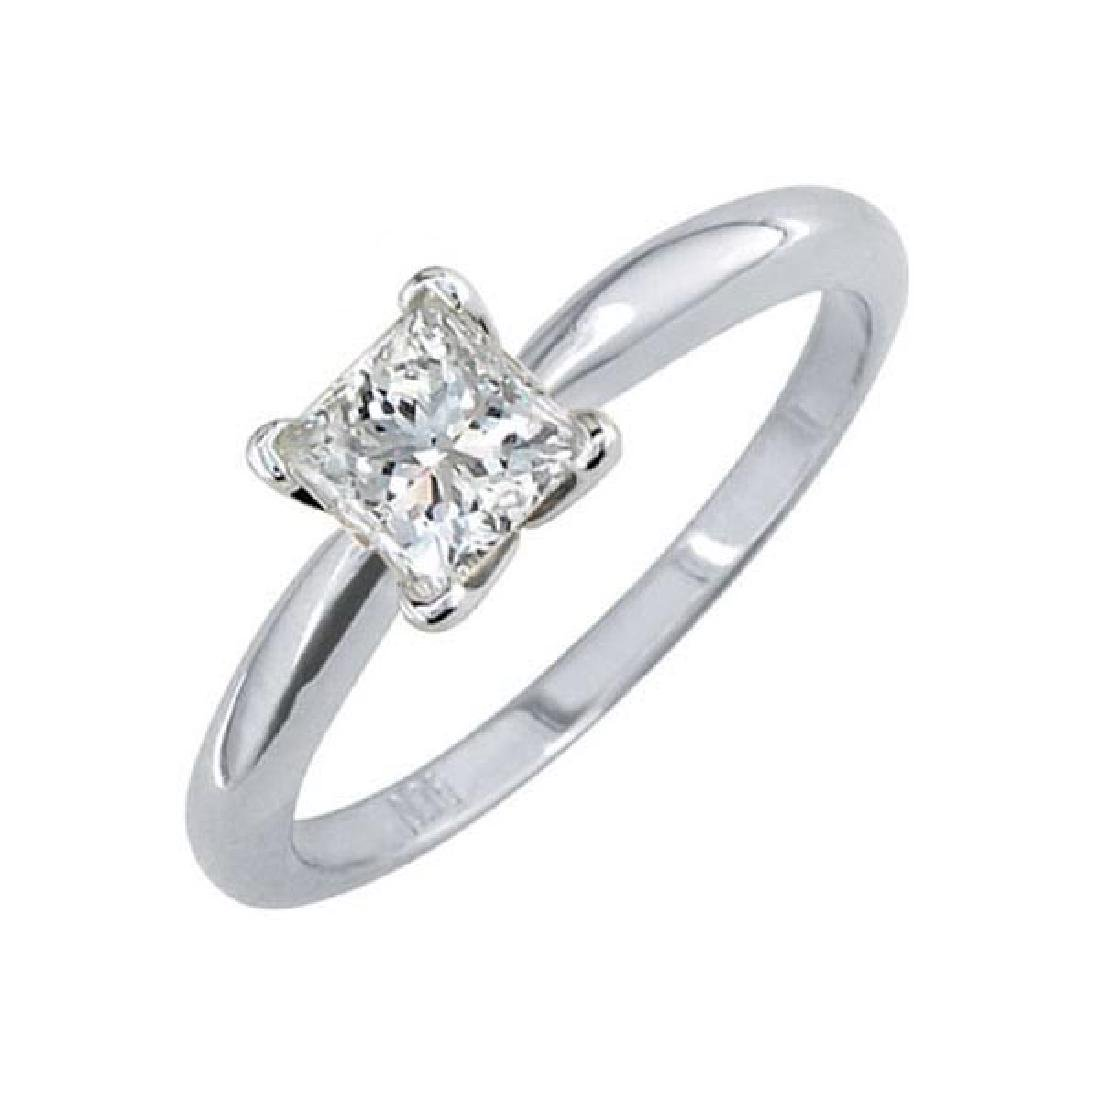 Certified 0.36 CTW Princess Diamond Solitaire 14k Ring